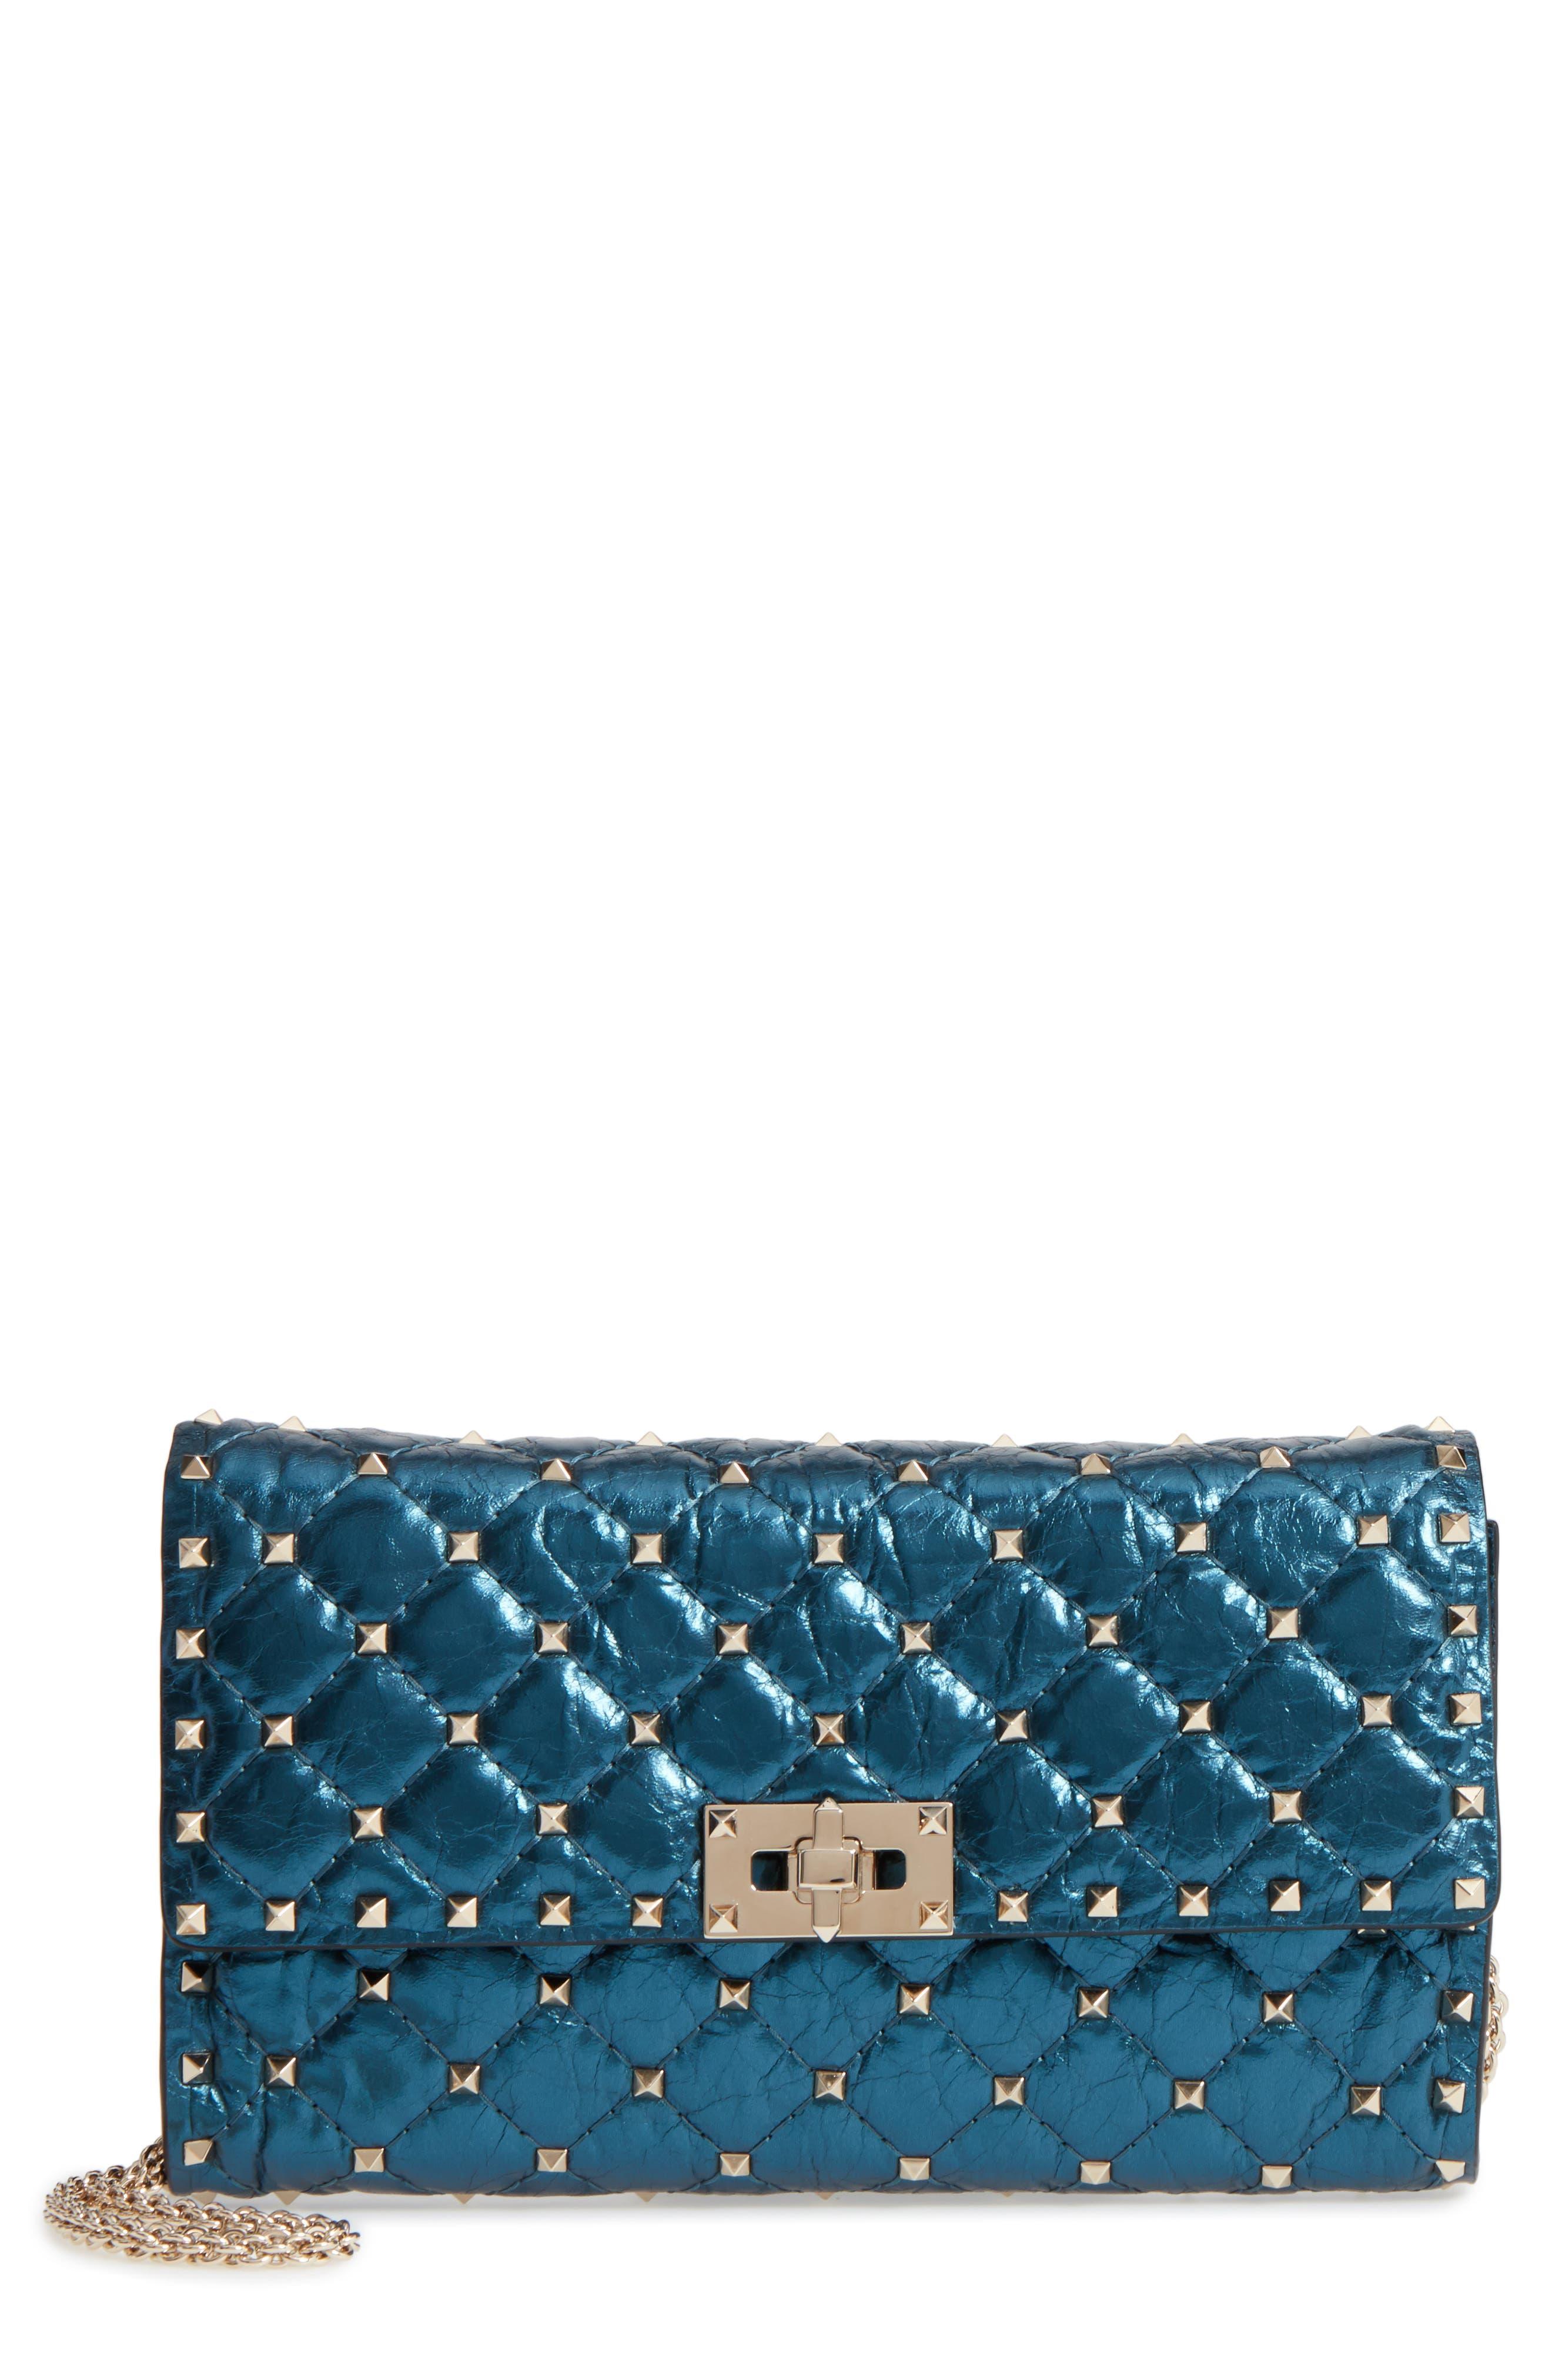 Main Image - VALENTINO GARAVANI Small Rockstud Spike Laminato Crossbody Bag